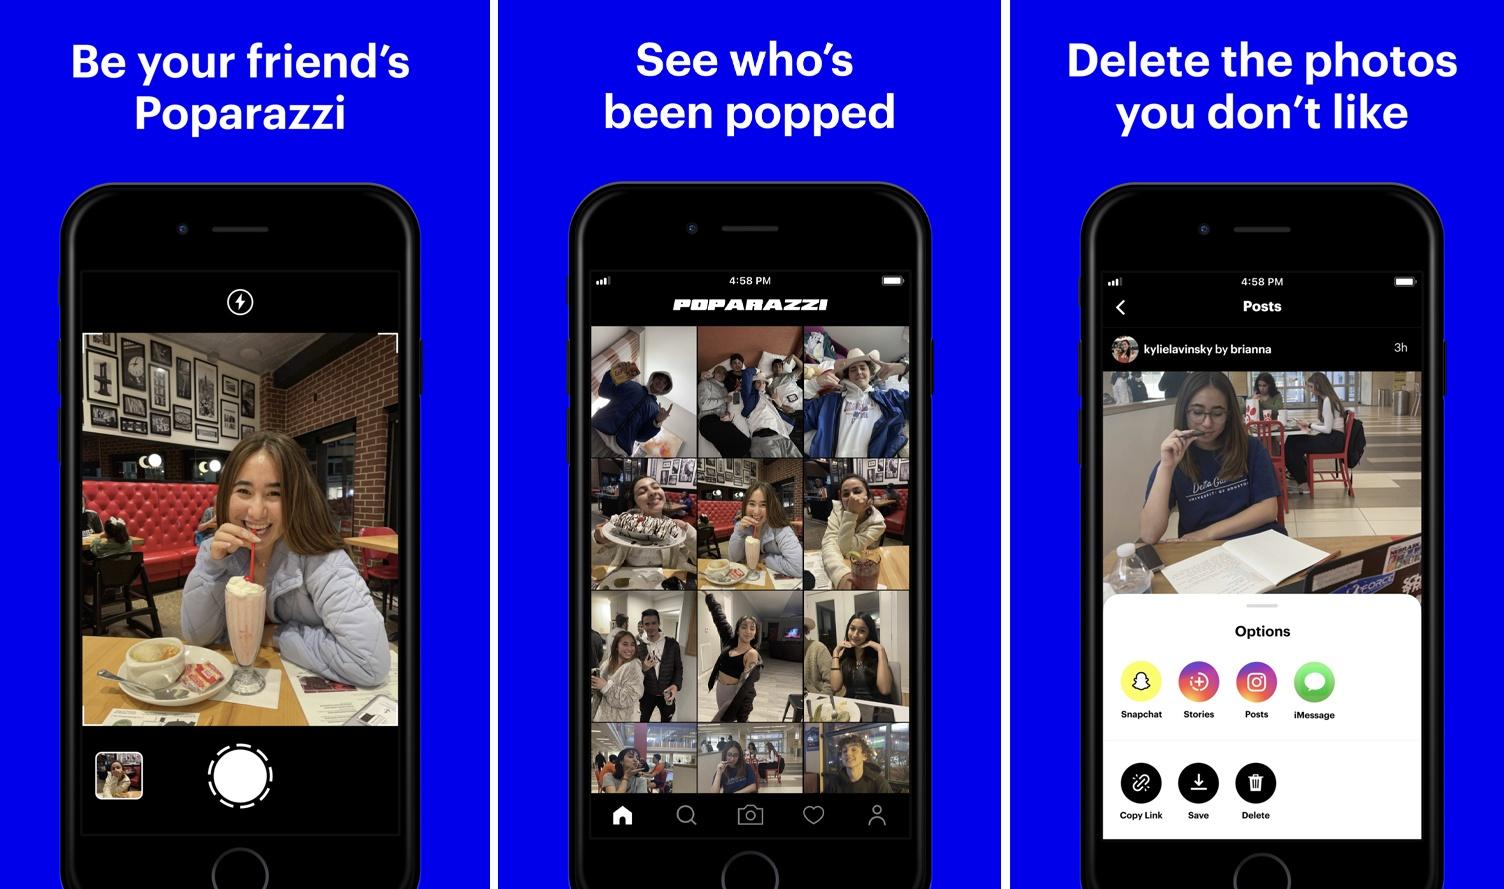 Capture Photos of Friends - Download the Anti-Selfie Poparazzi App